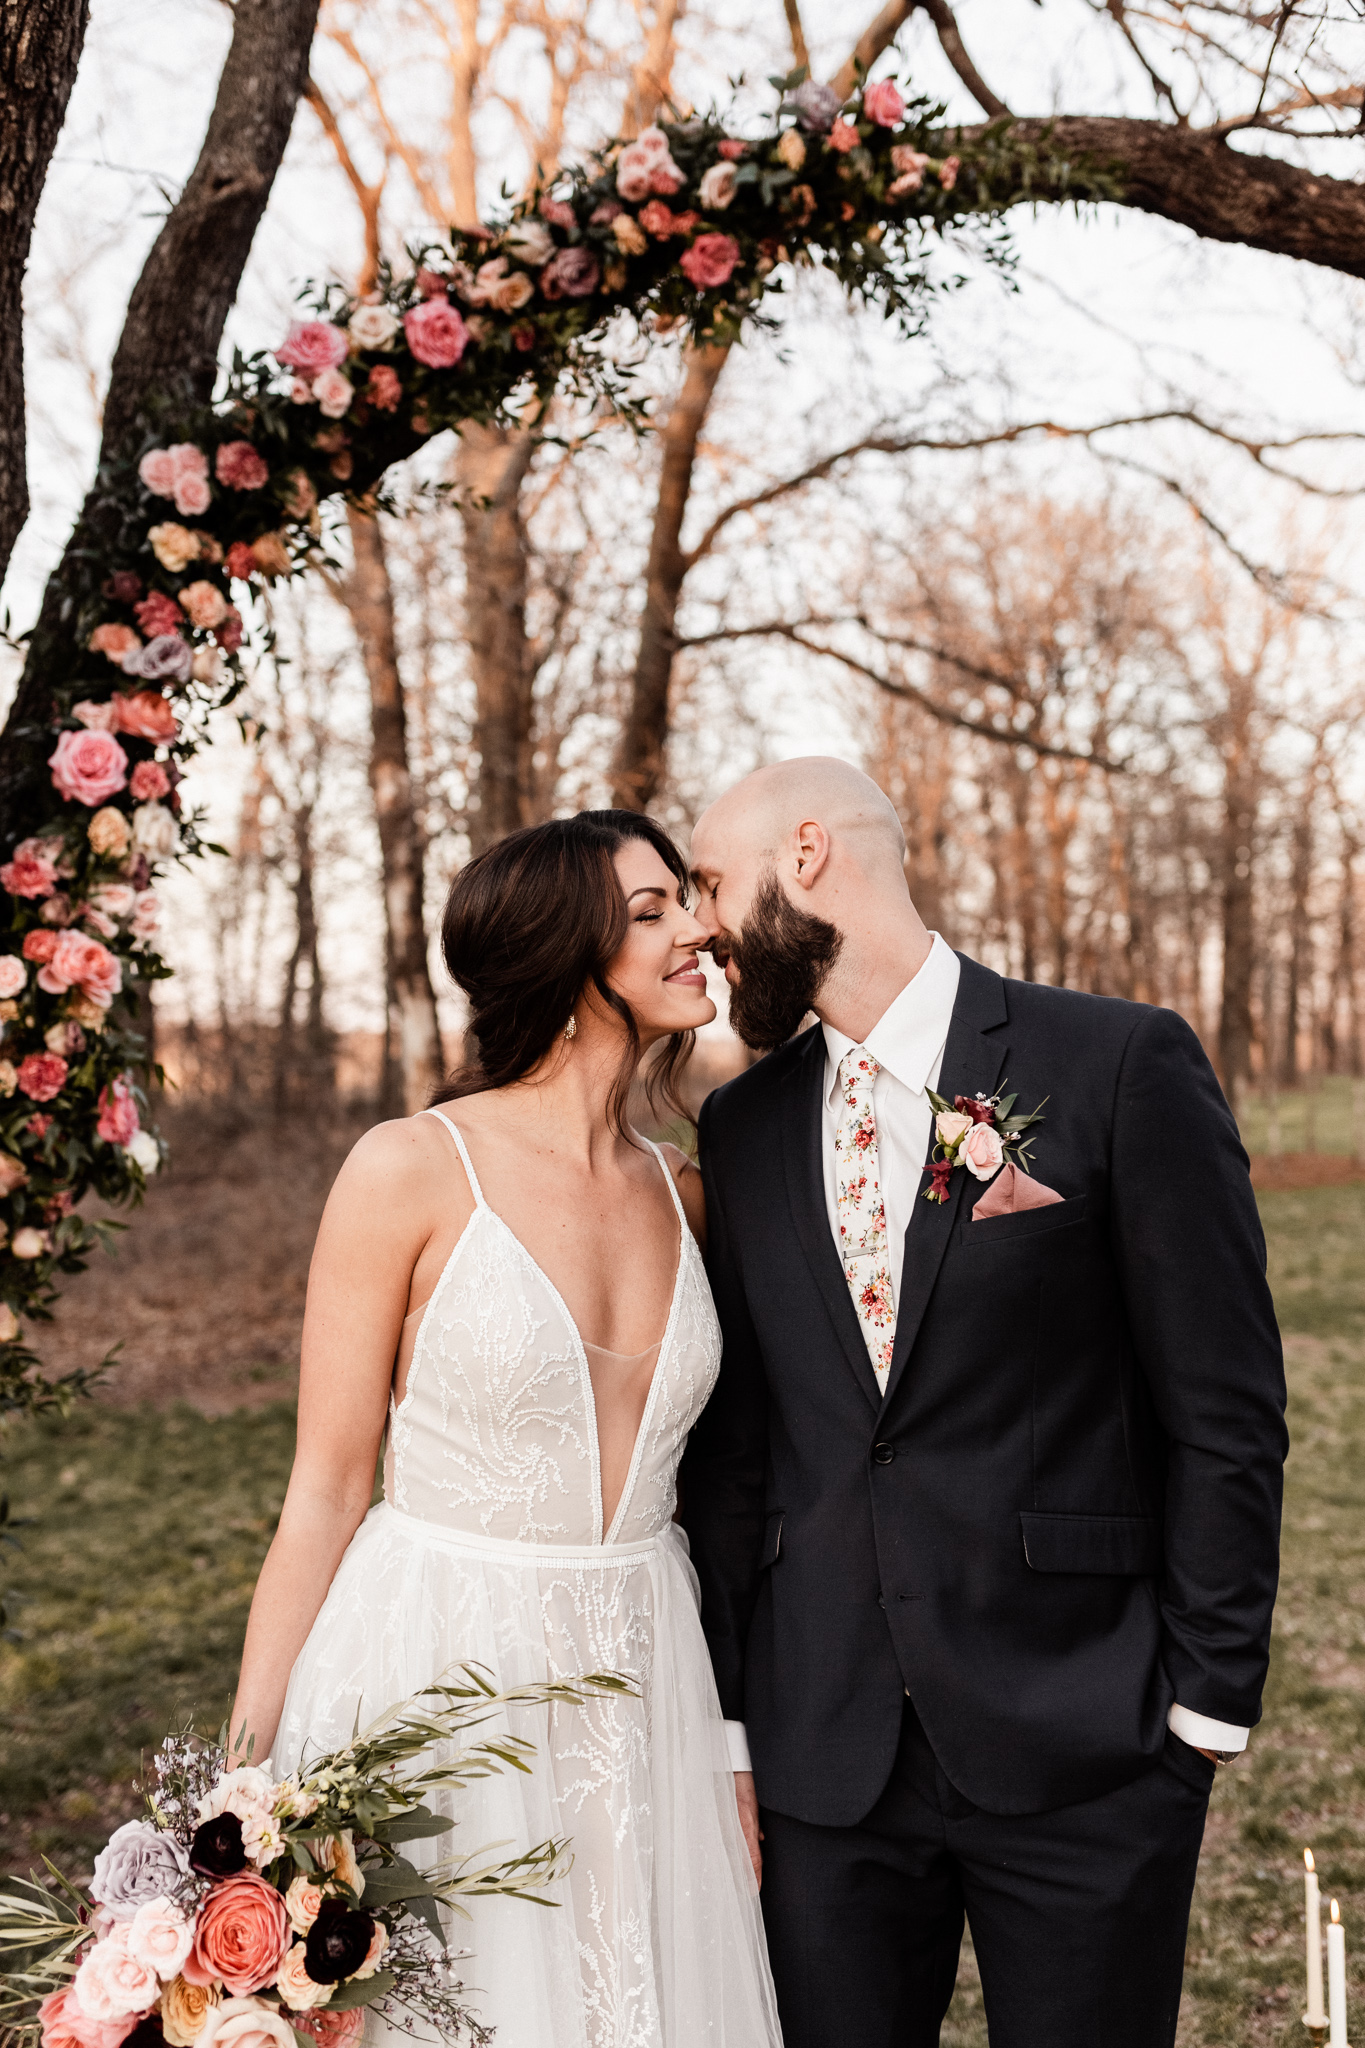 Cultivate Event Planning Styled Shoot   Colorful Romantic Barn Wedding Inspo   Oklahoma Wedding Photographer-100.jpg